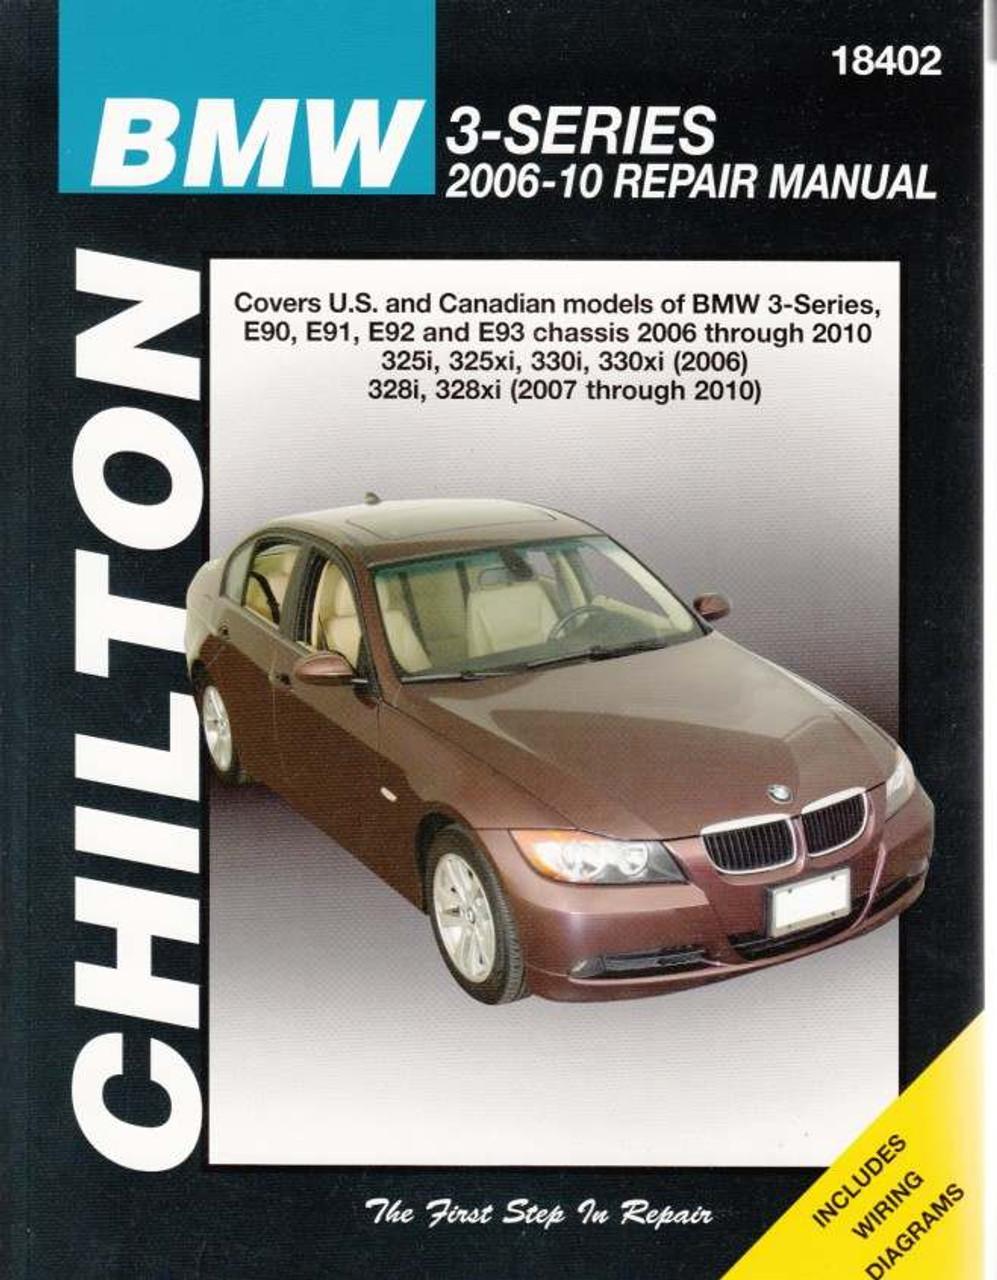 Buy Bmw 3 Series E90 E91 E92 E93 2006 2010 Workshop Manual